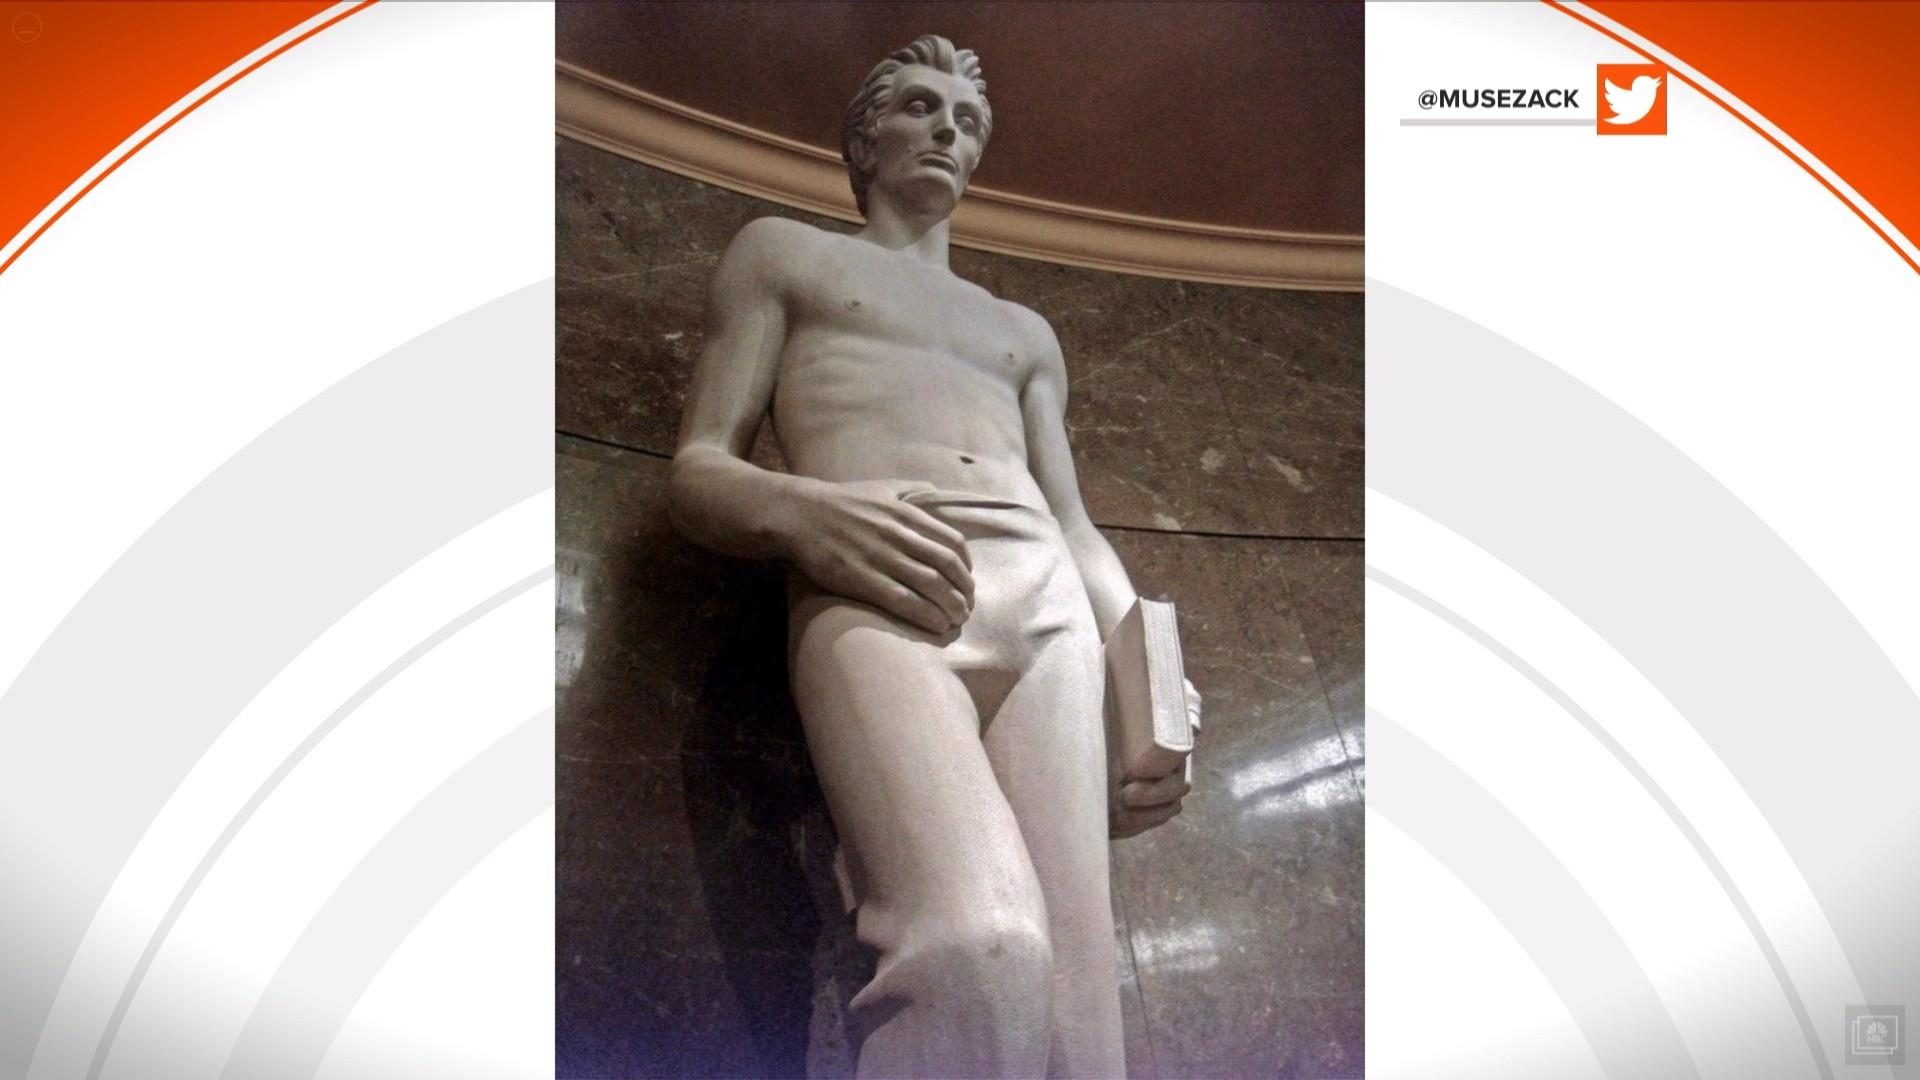 Shirtless Abraham Lincoln statue steams up social media